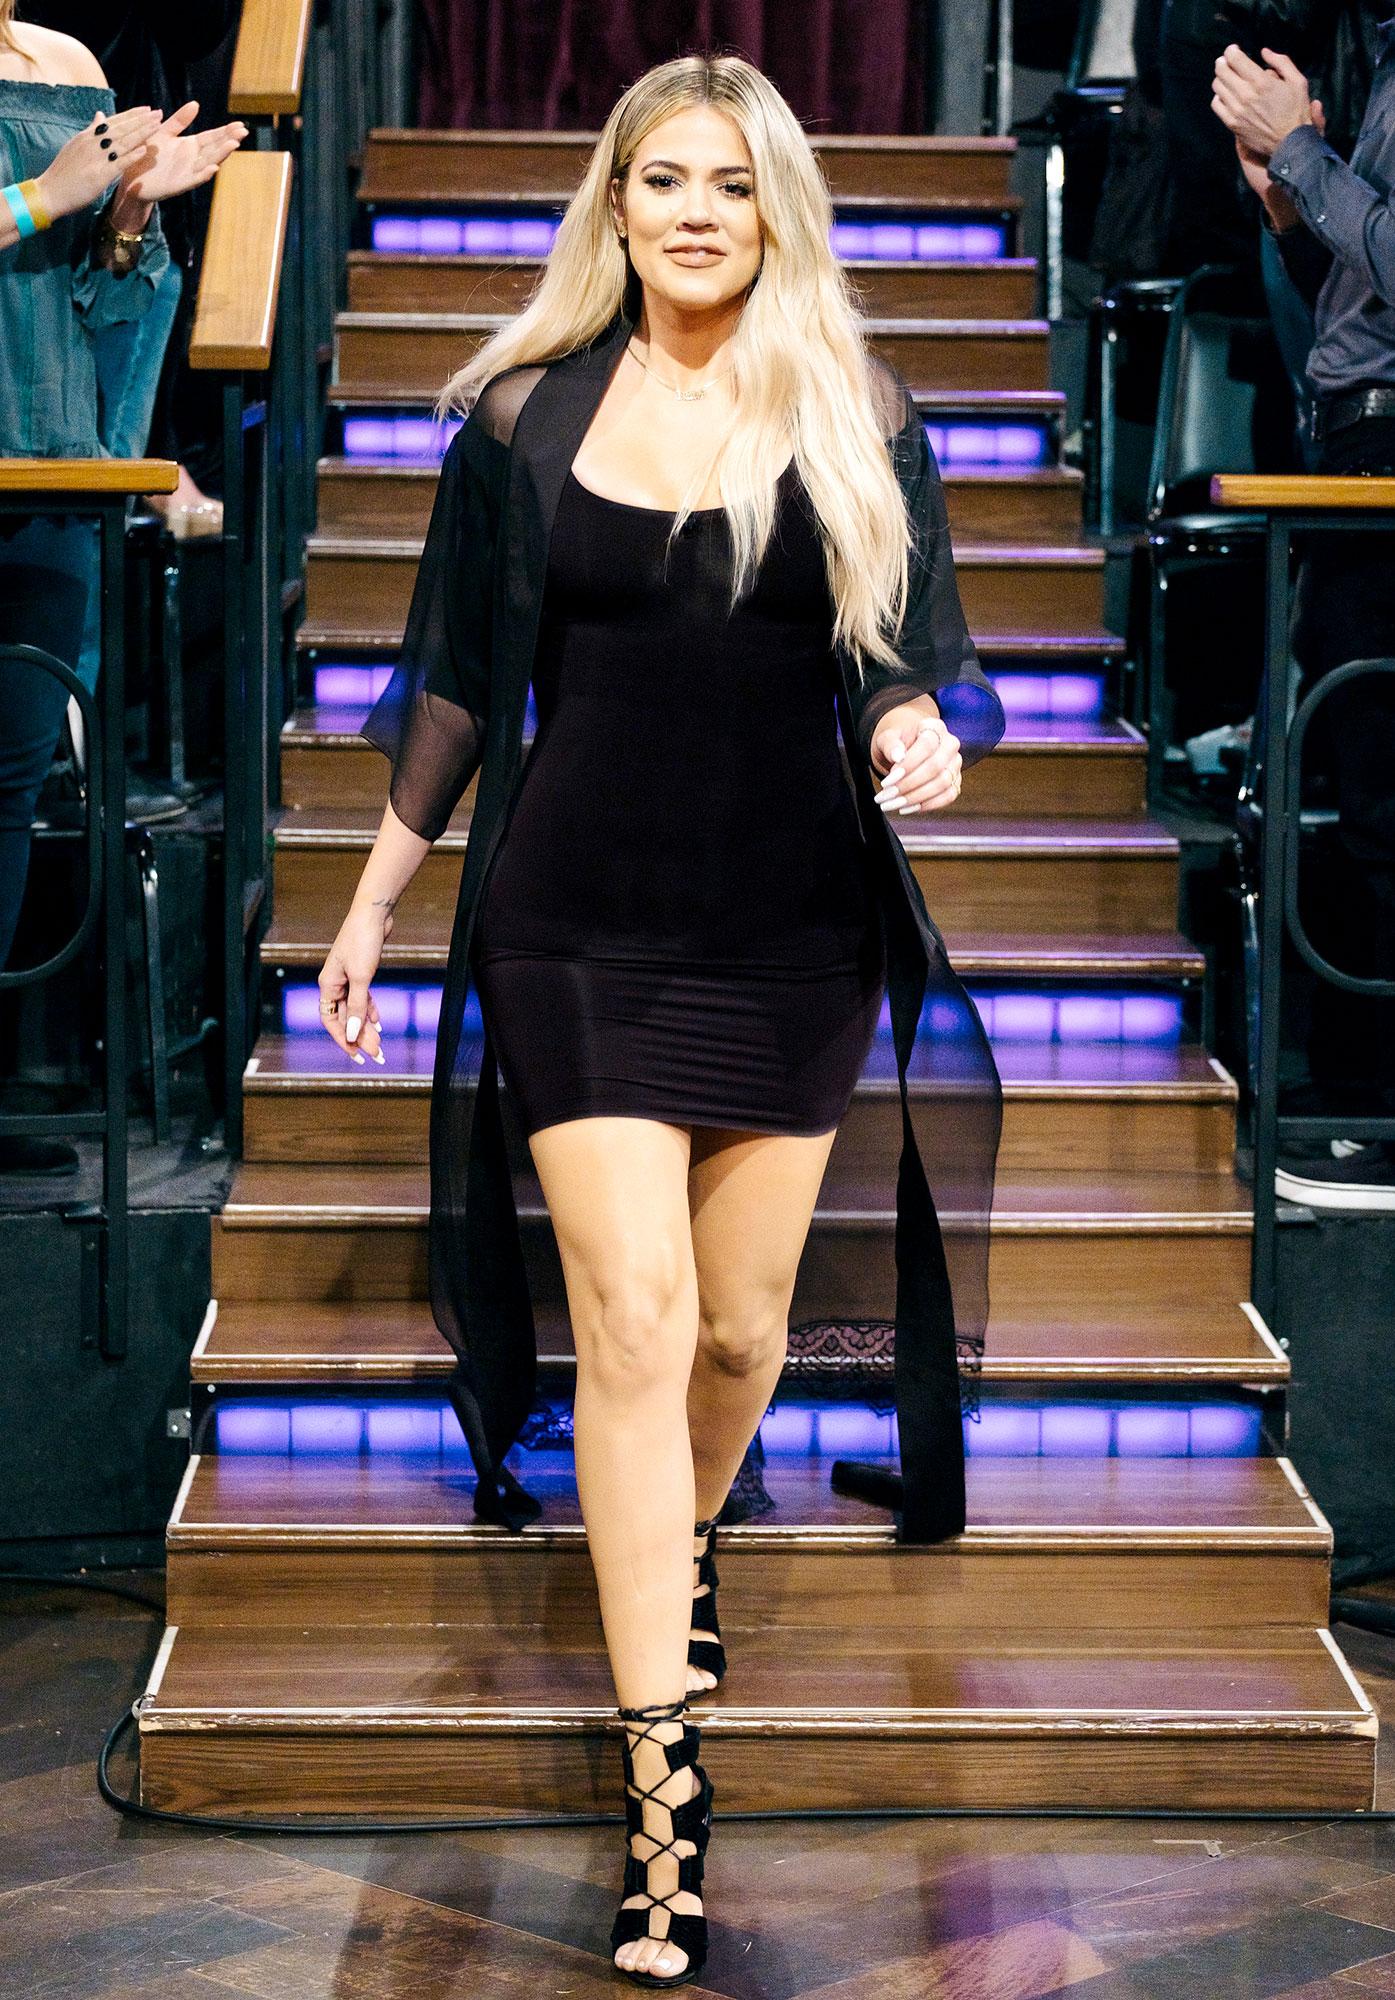 Khloe Kardashian joins James Corden on